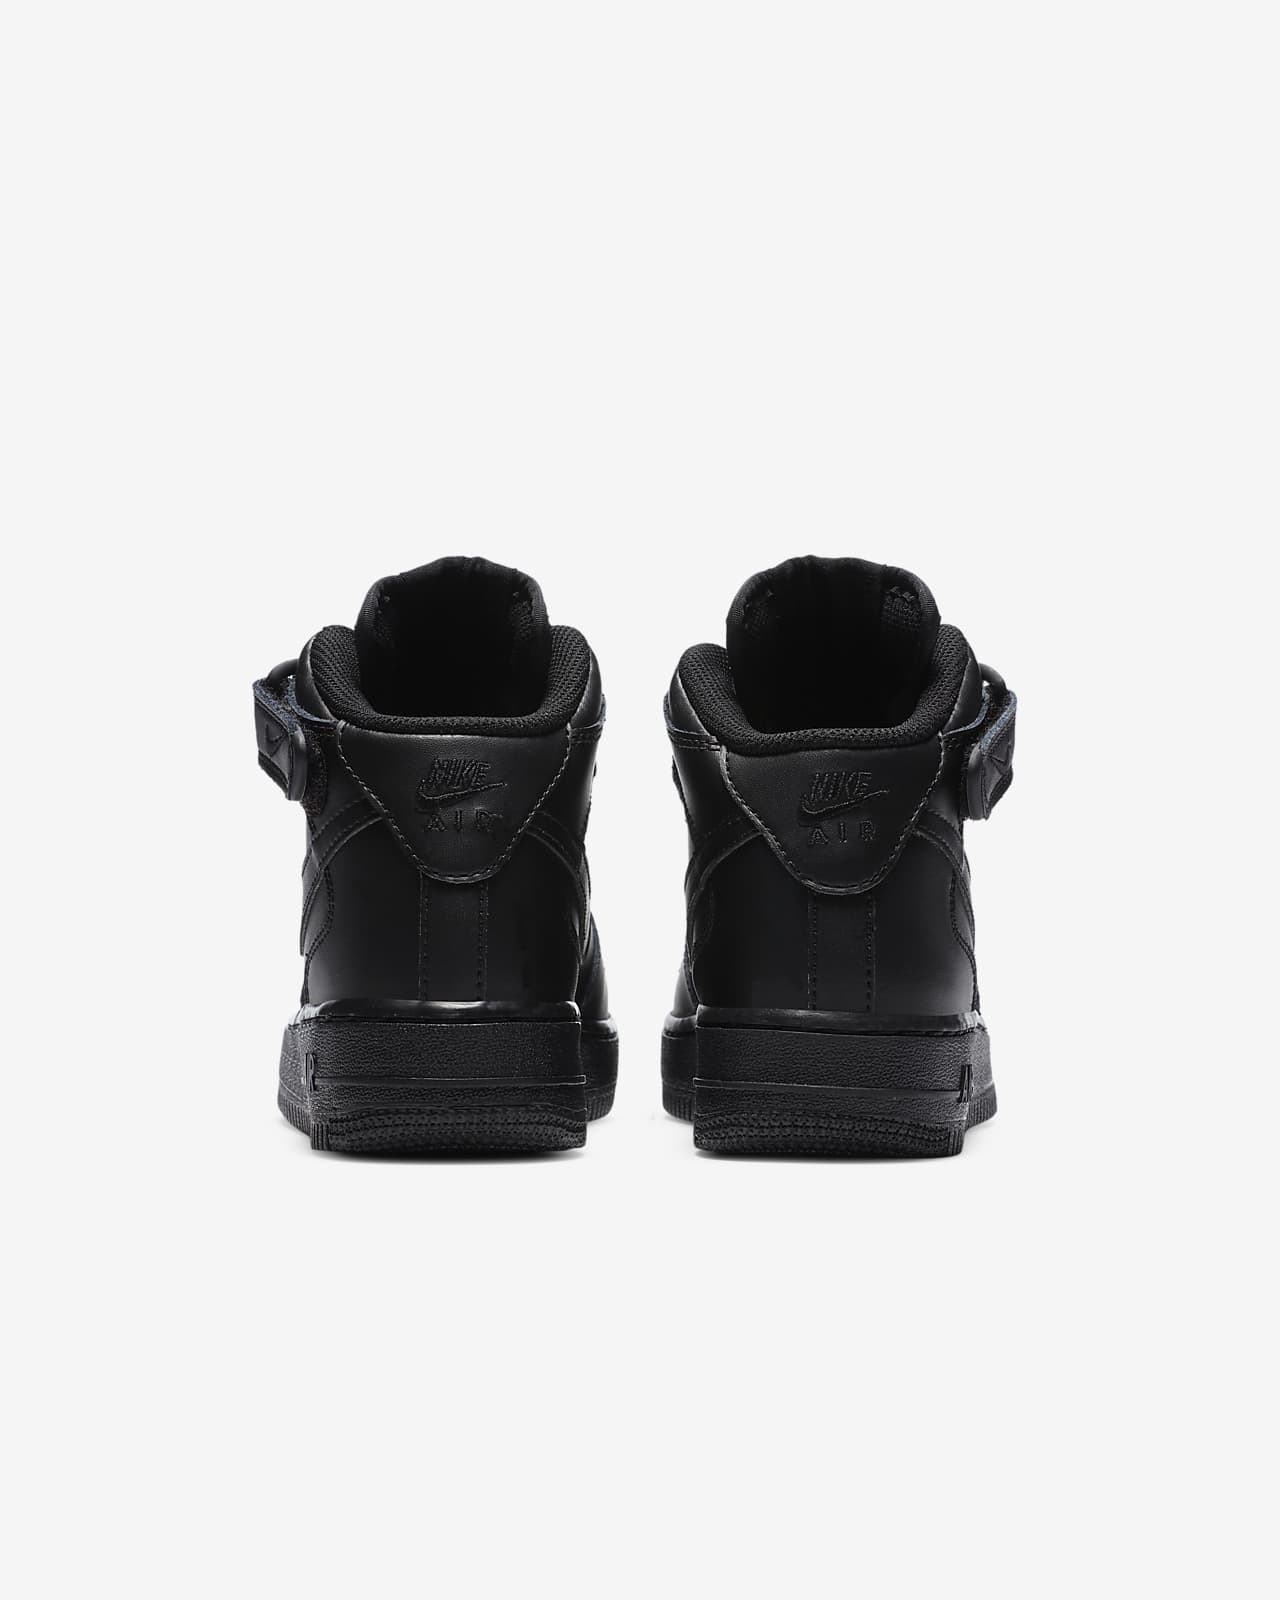 Chaussure Nike Air Force 1 06 mi montante pour Garçon